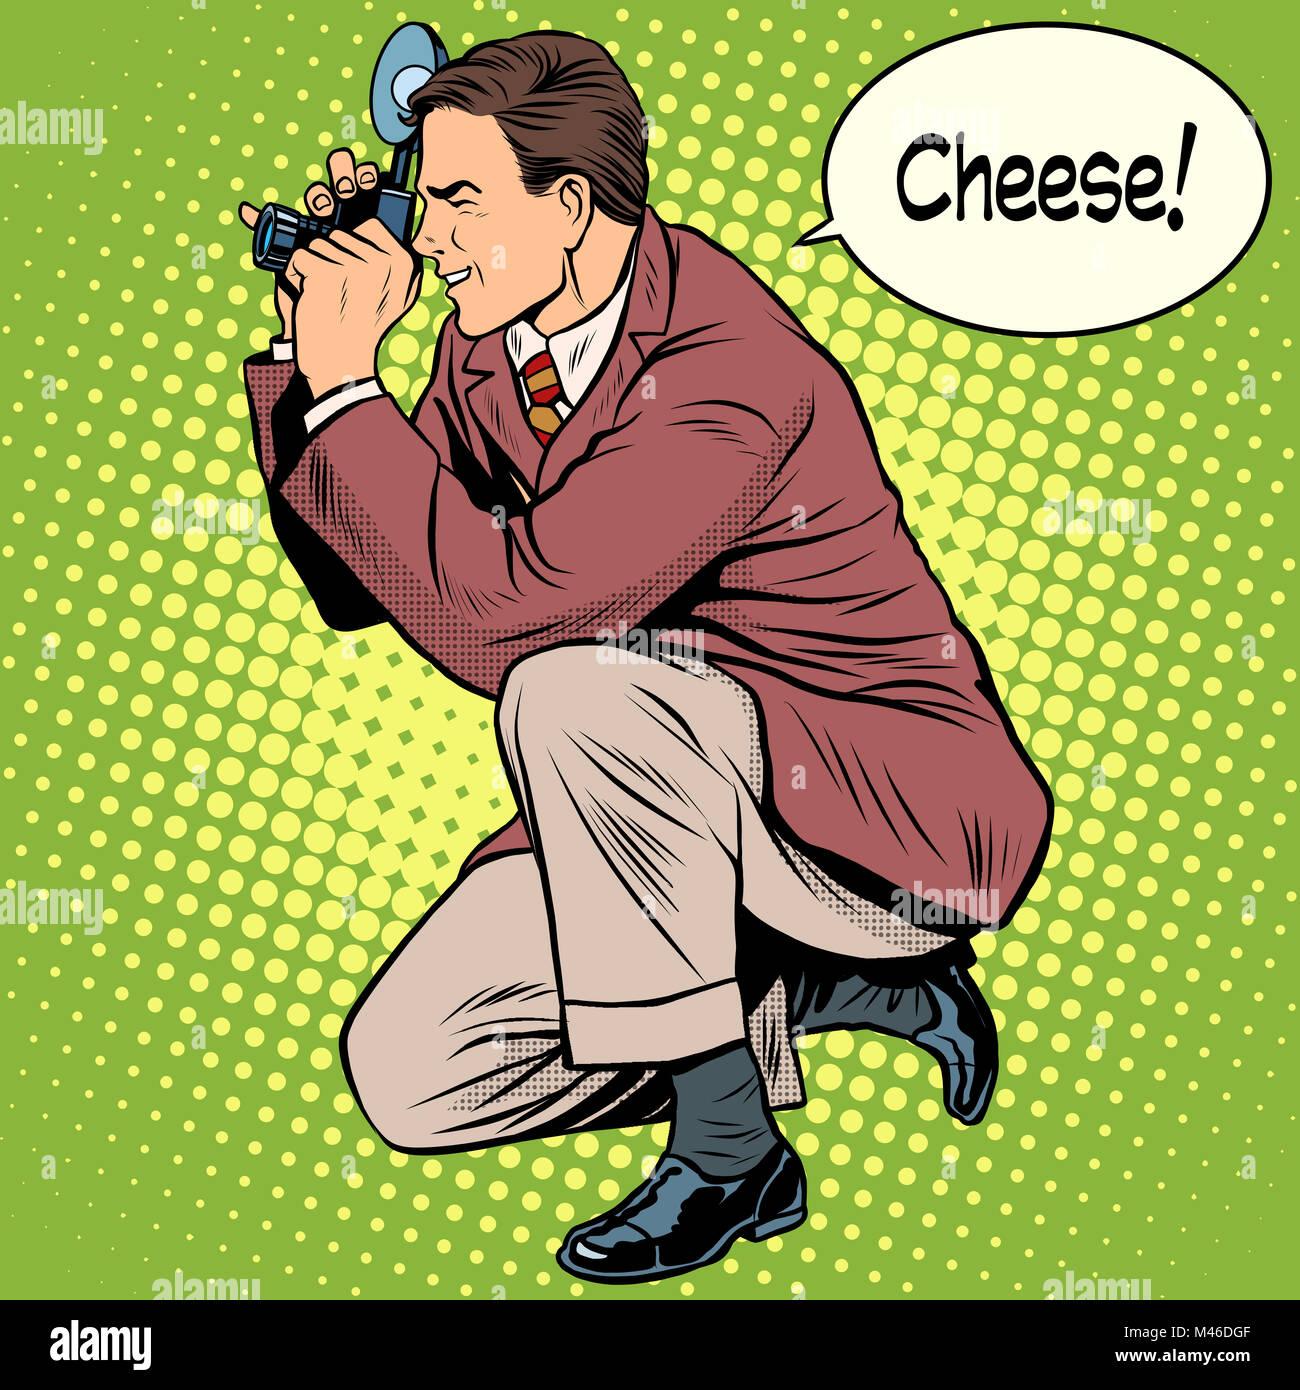 cheese pop art stock photos cheese pop art stock images alamy